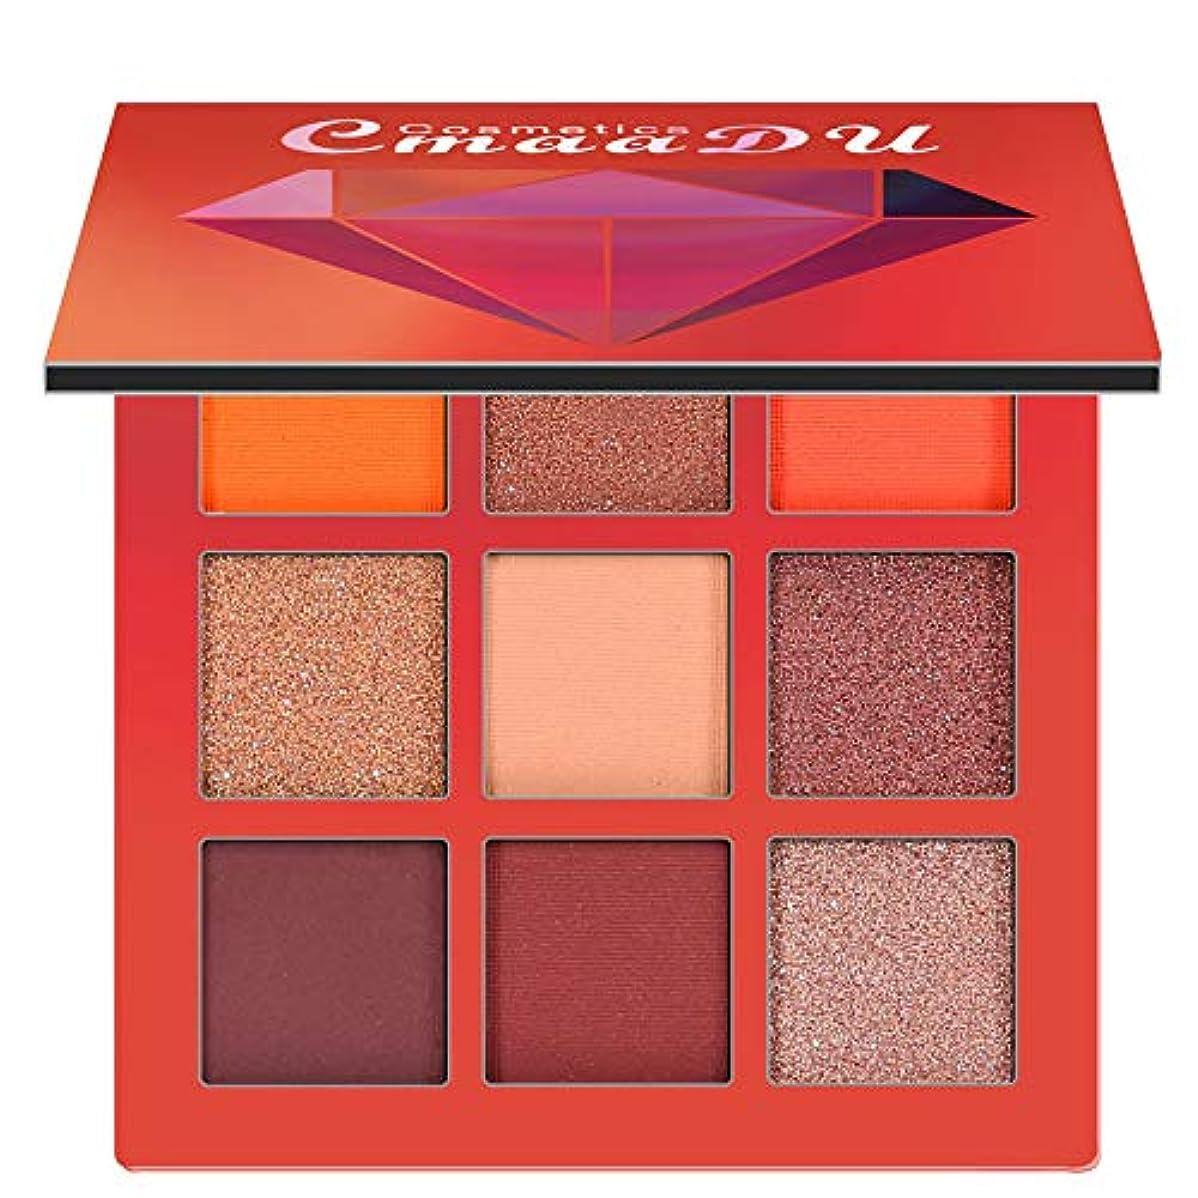 RedPeg新しい9色シマーグリッターアイシャドウパウダーパレットファッションマットアイシャドウ化粧品アイシャドウ化粧パレット